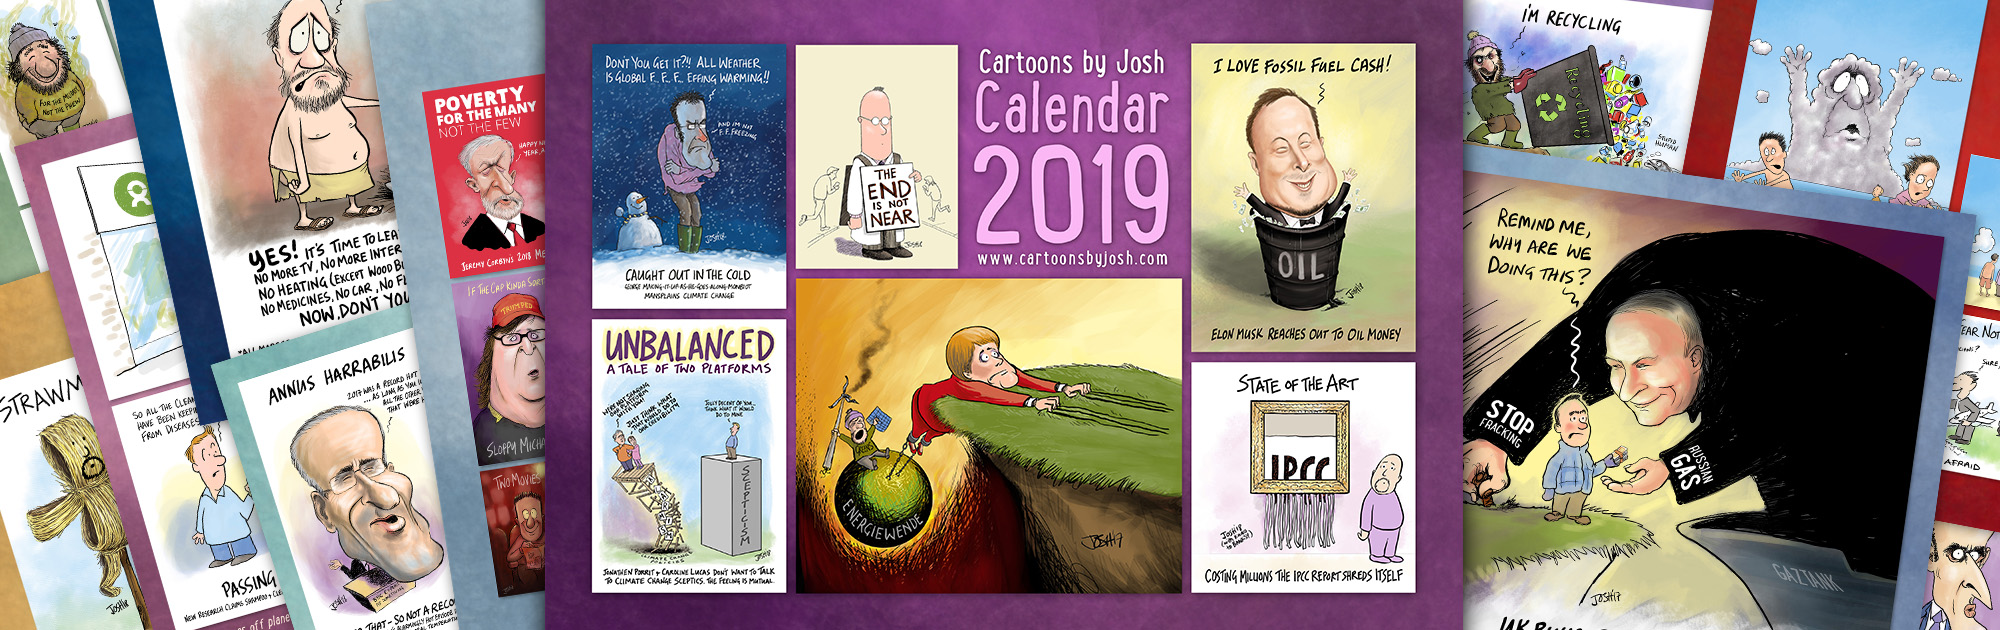 Cartoon kalender 2019